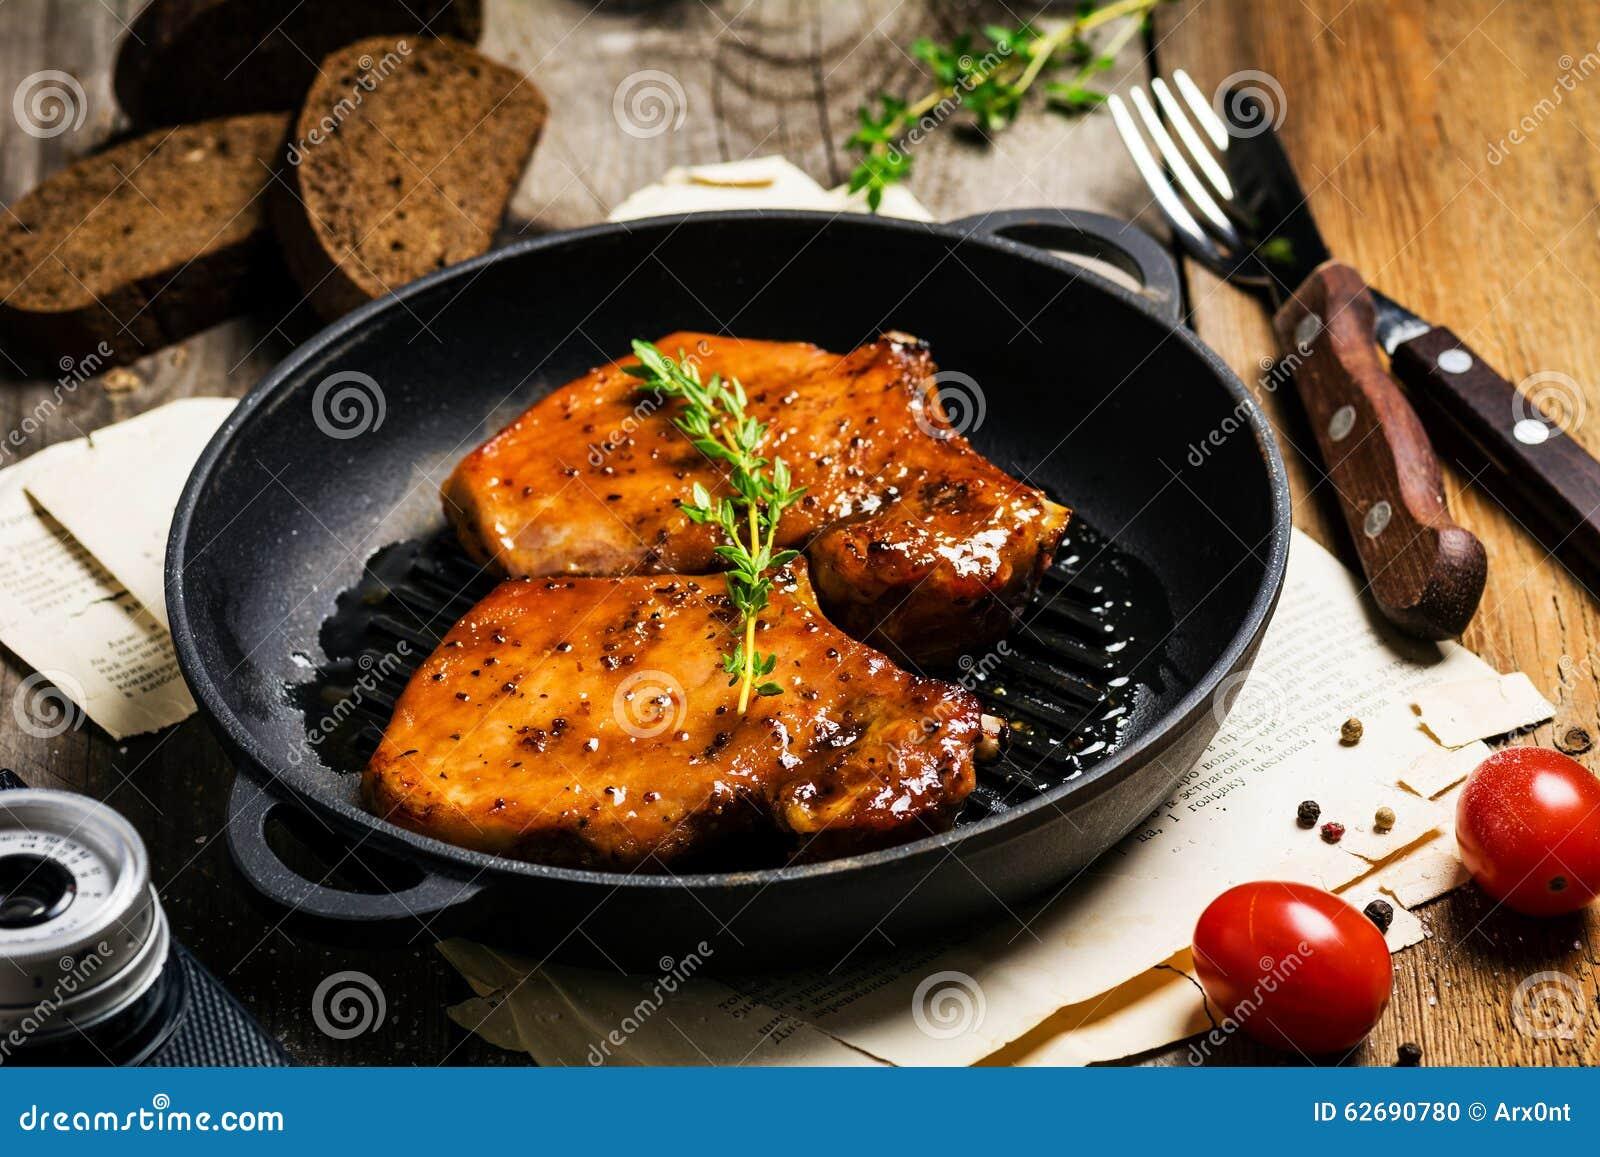 BBQ pork chops in sweet glaze